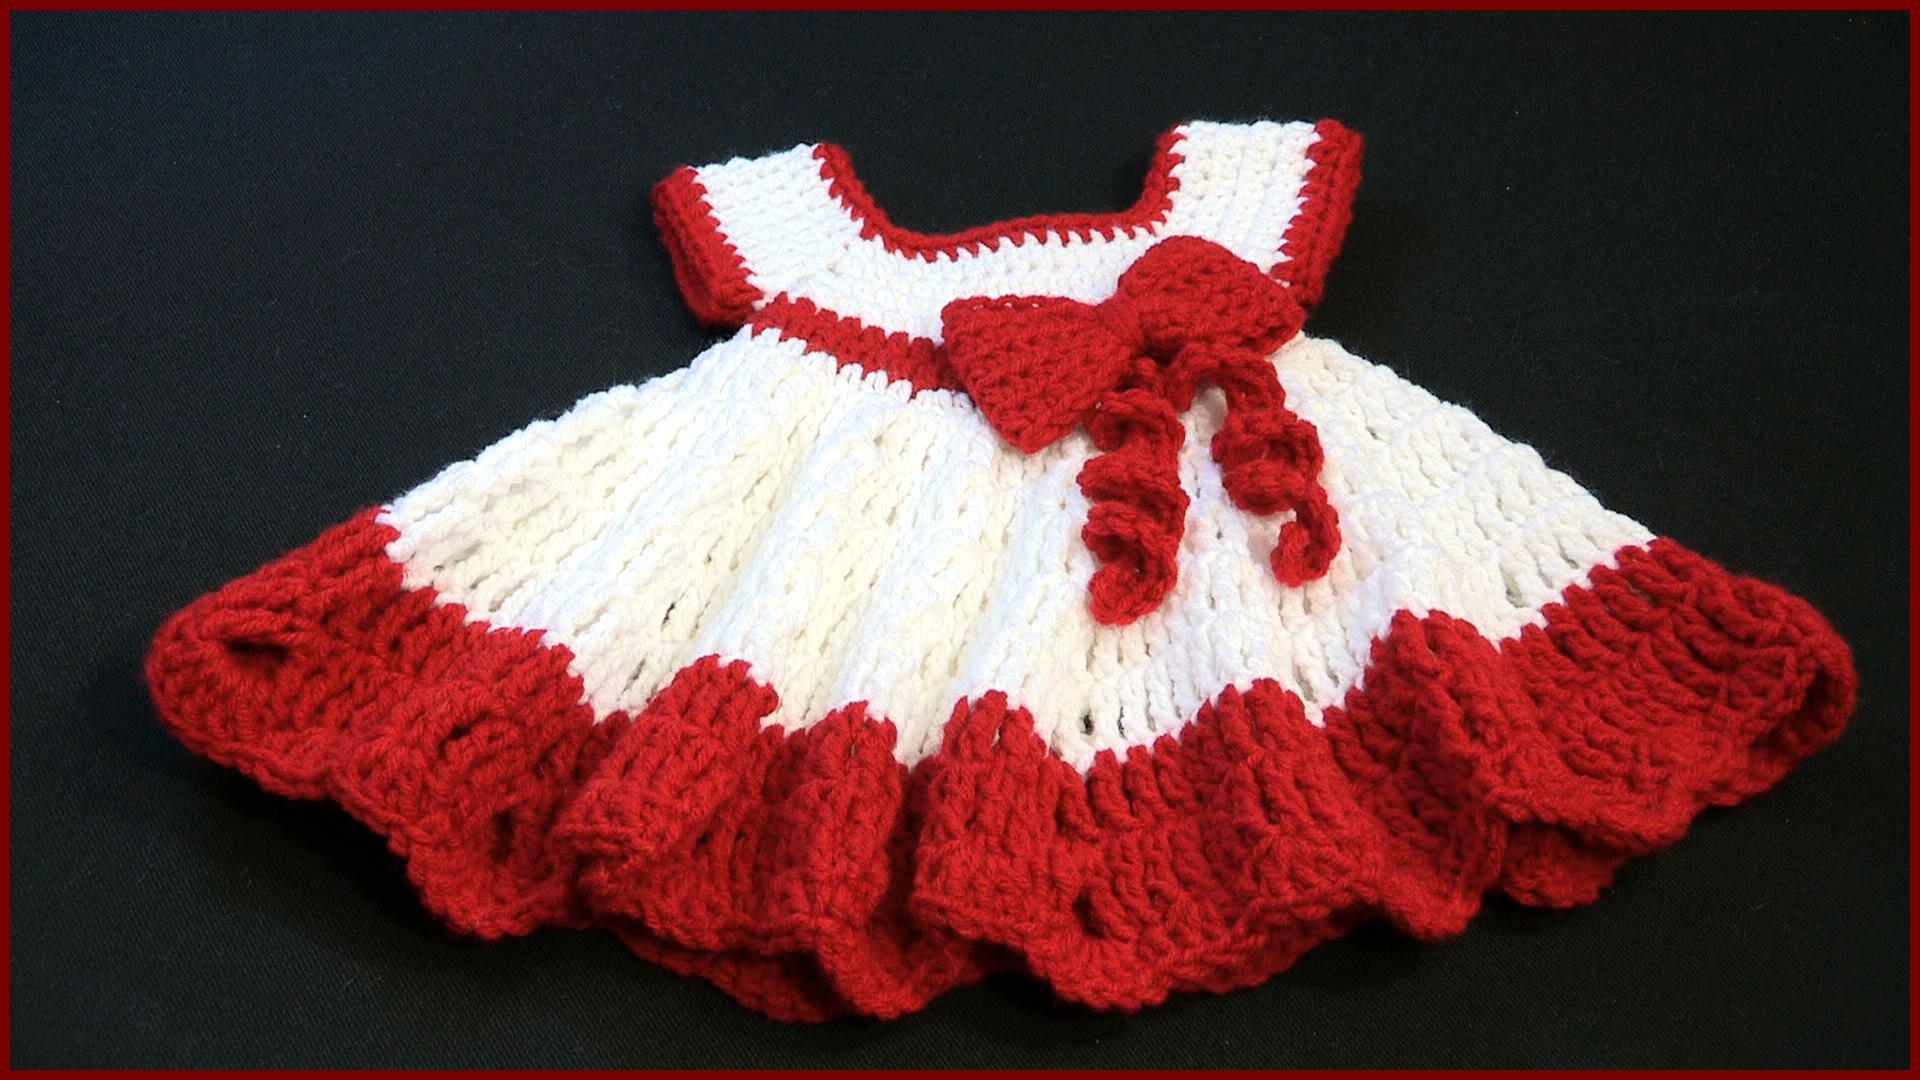 Crochet Tutorial Baby Dress With A Bow Yarnutopia By